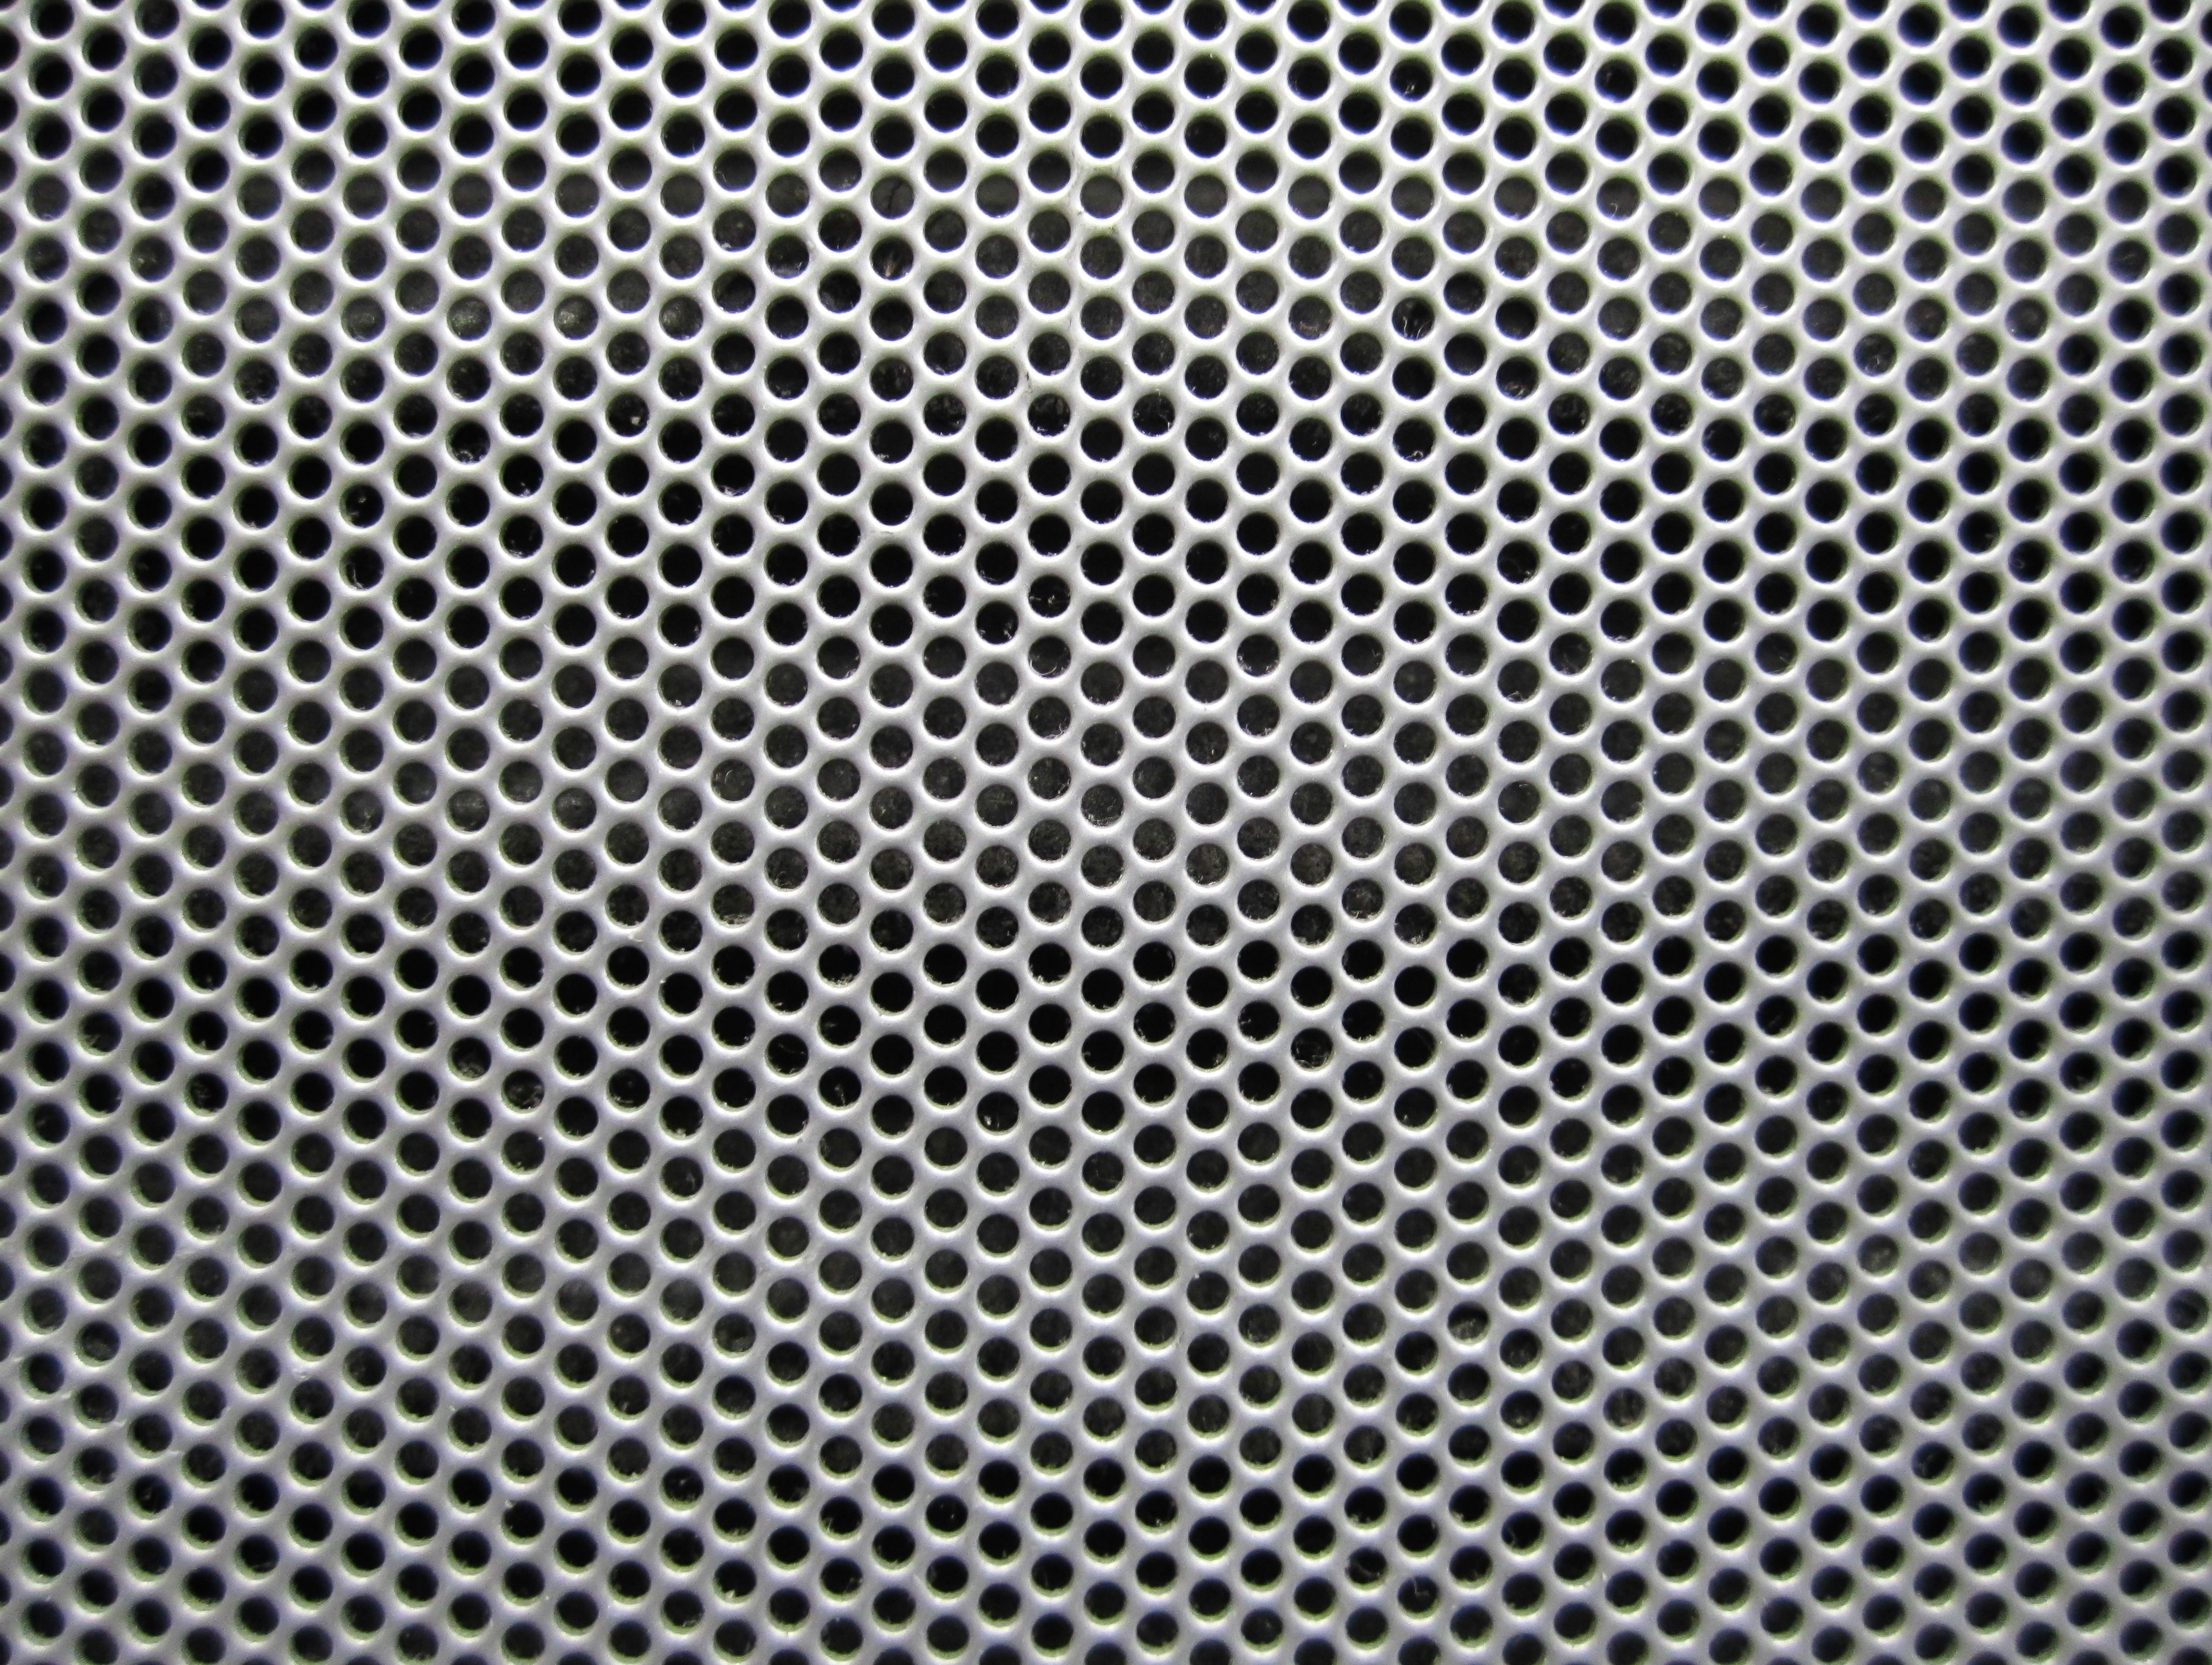 metal texture hole dusty stock photo wallpaper greyjpg